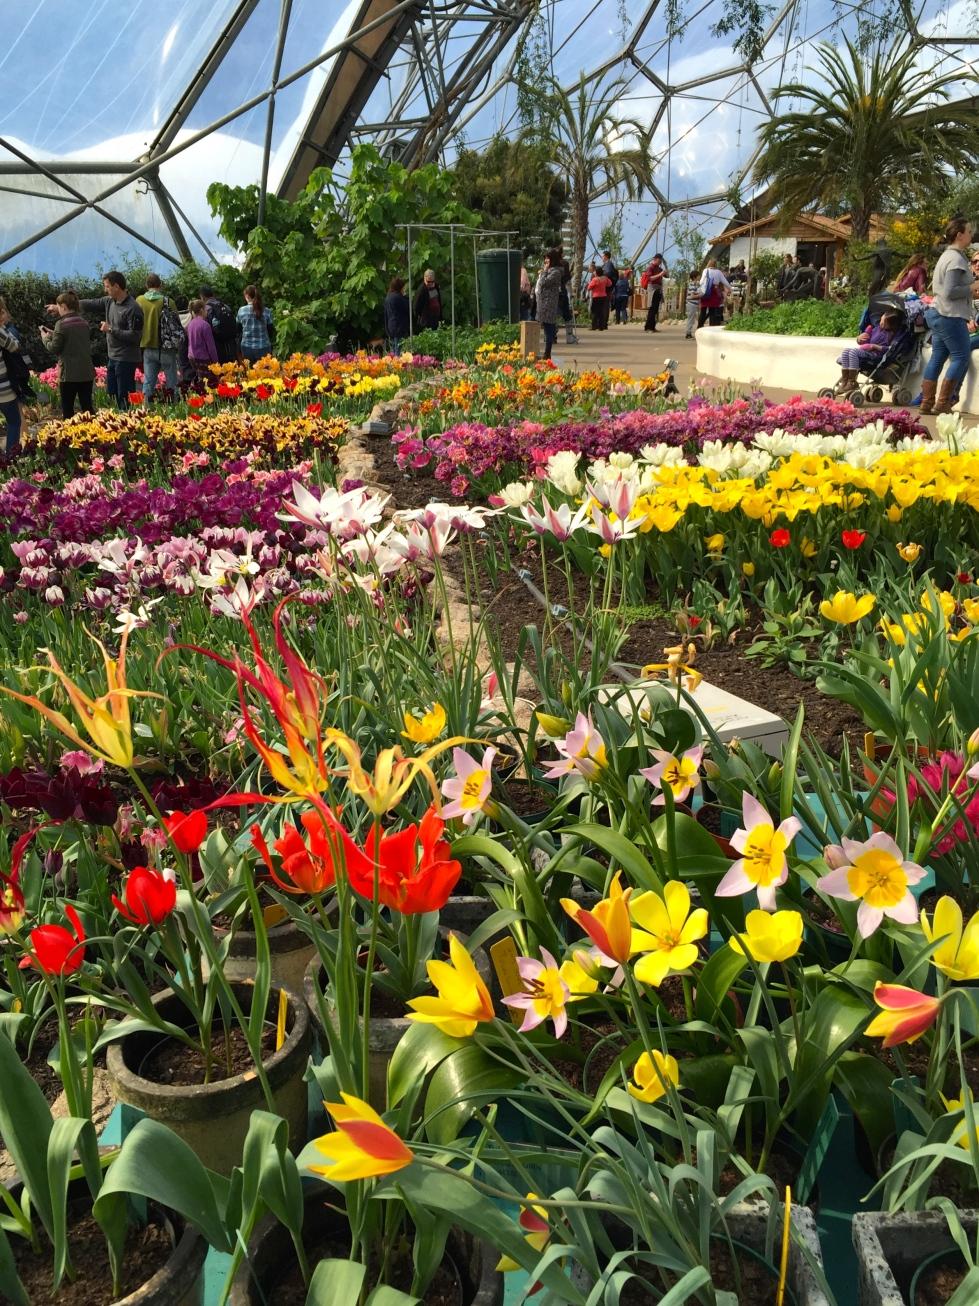 Crowd pleasing displays of tulips in the Mediterranean biome